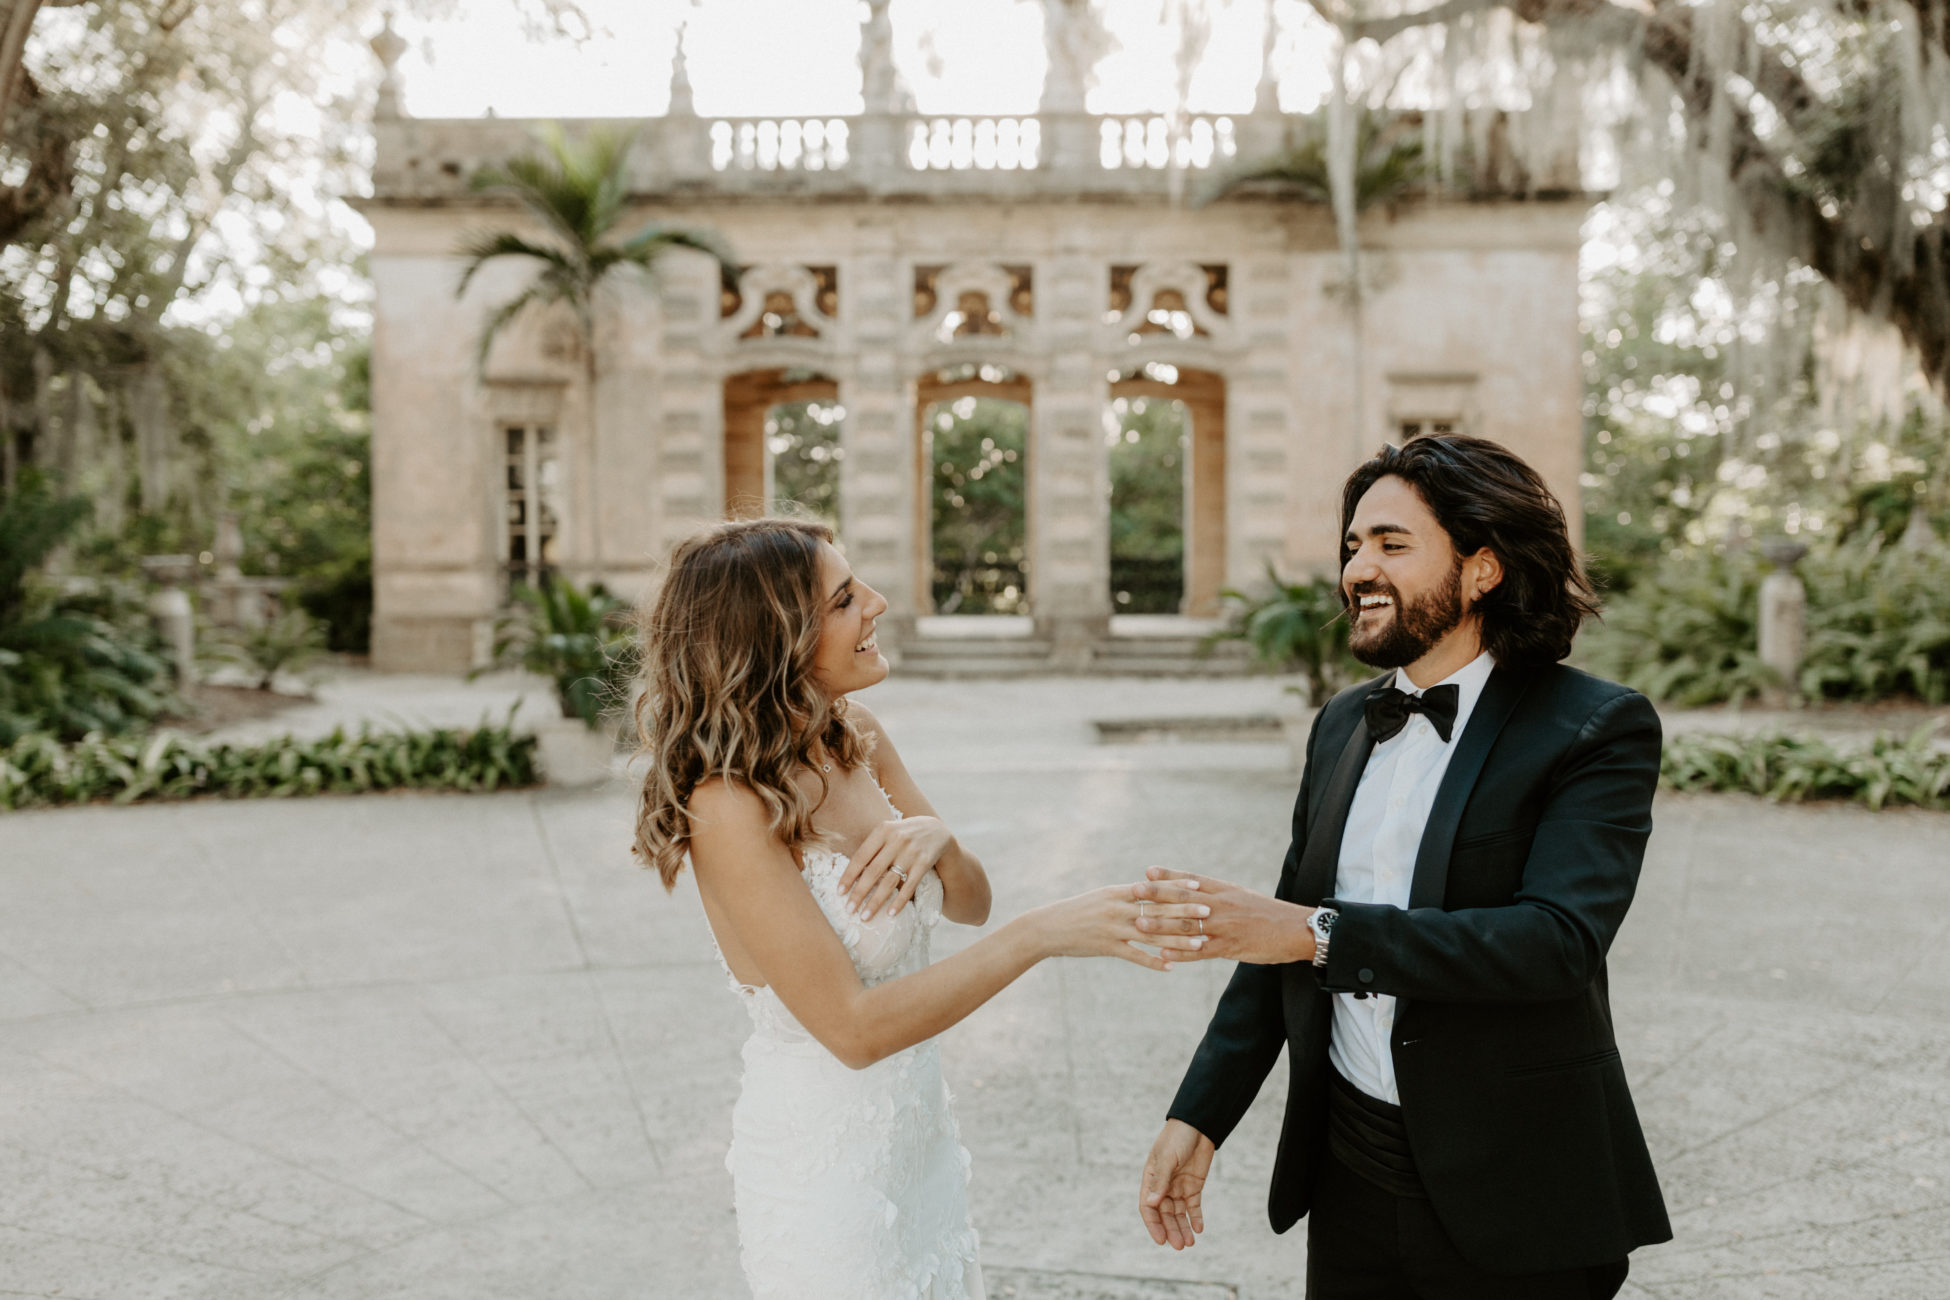 Rochester + New York City wedding photographer